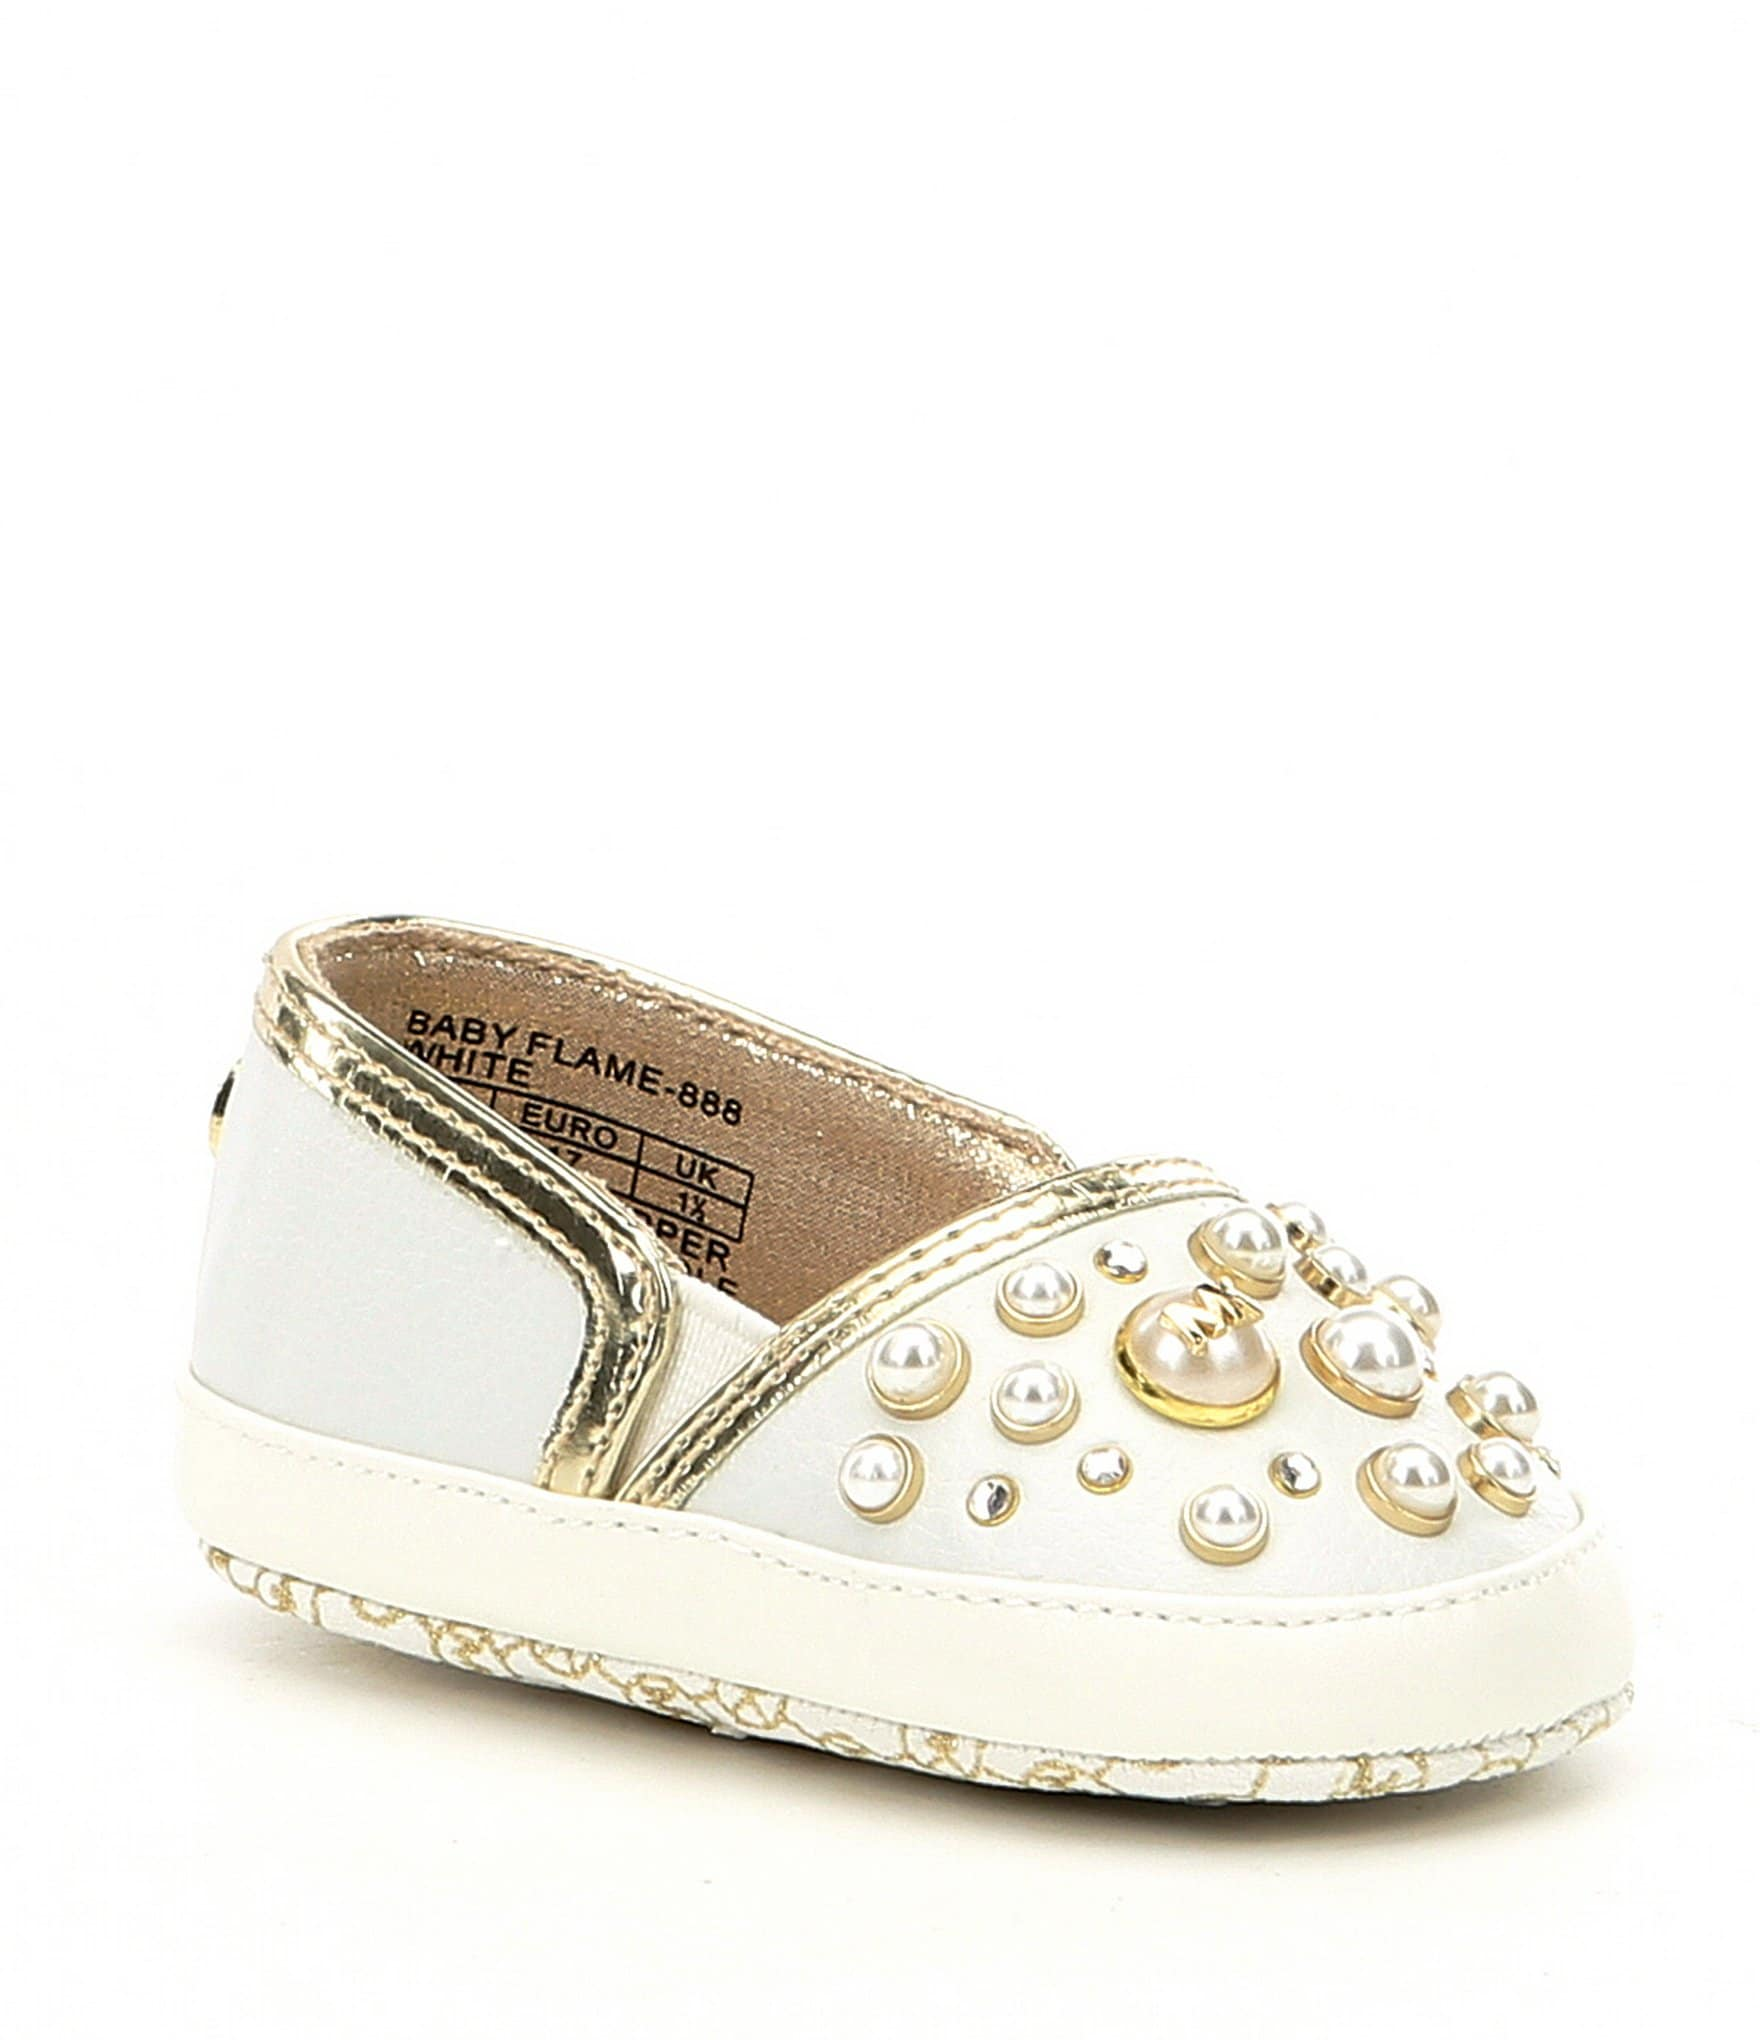 MICHAEL Michael Kors Infant Girls Shoes